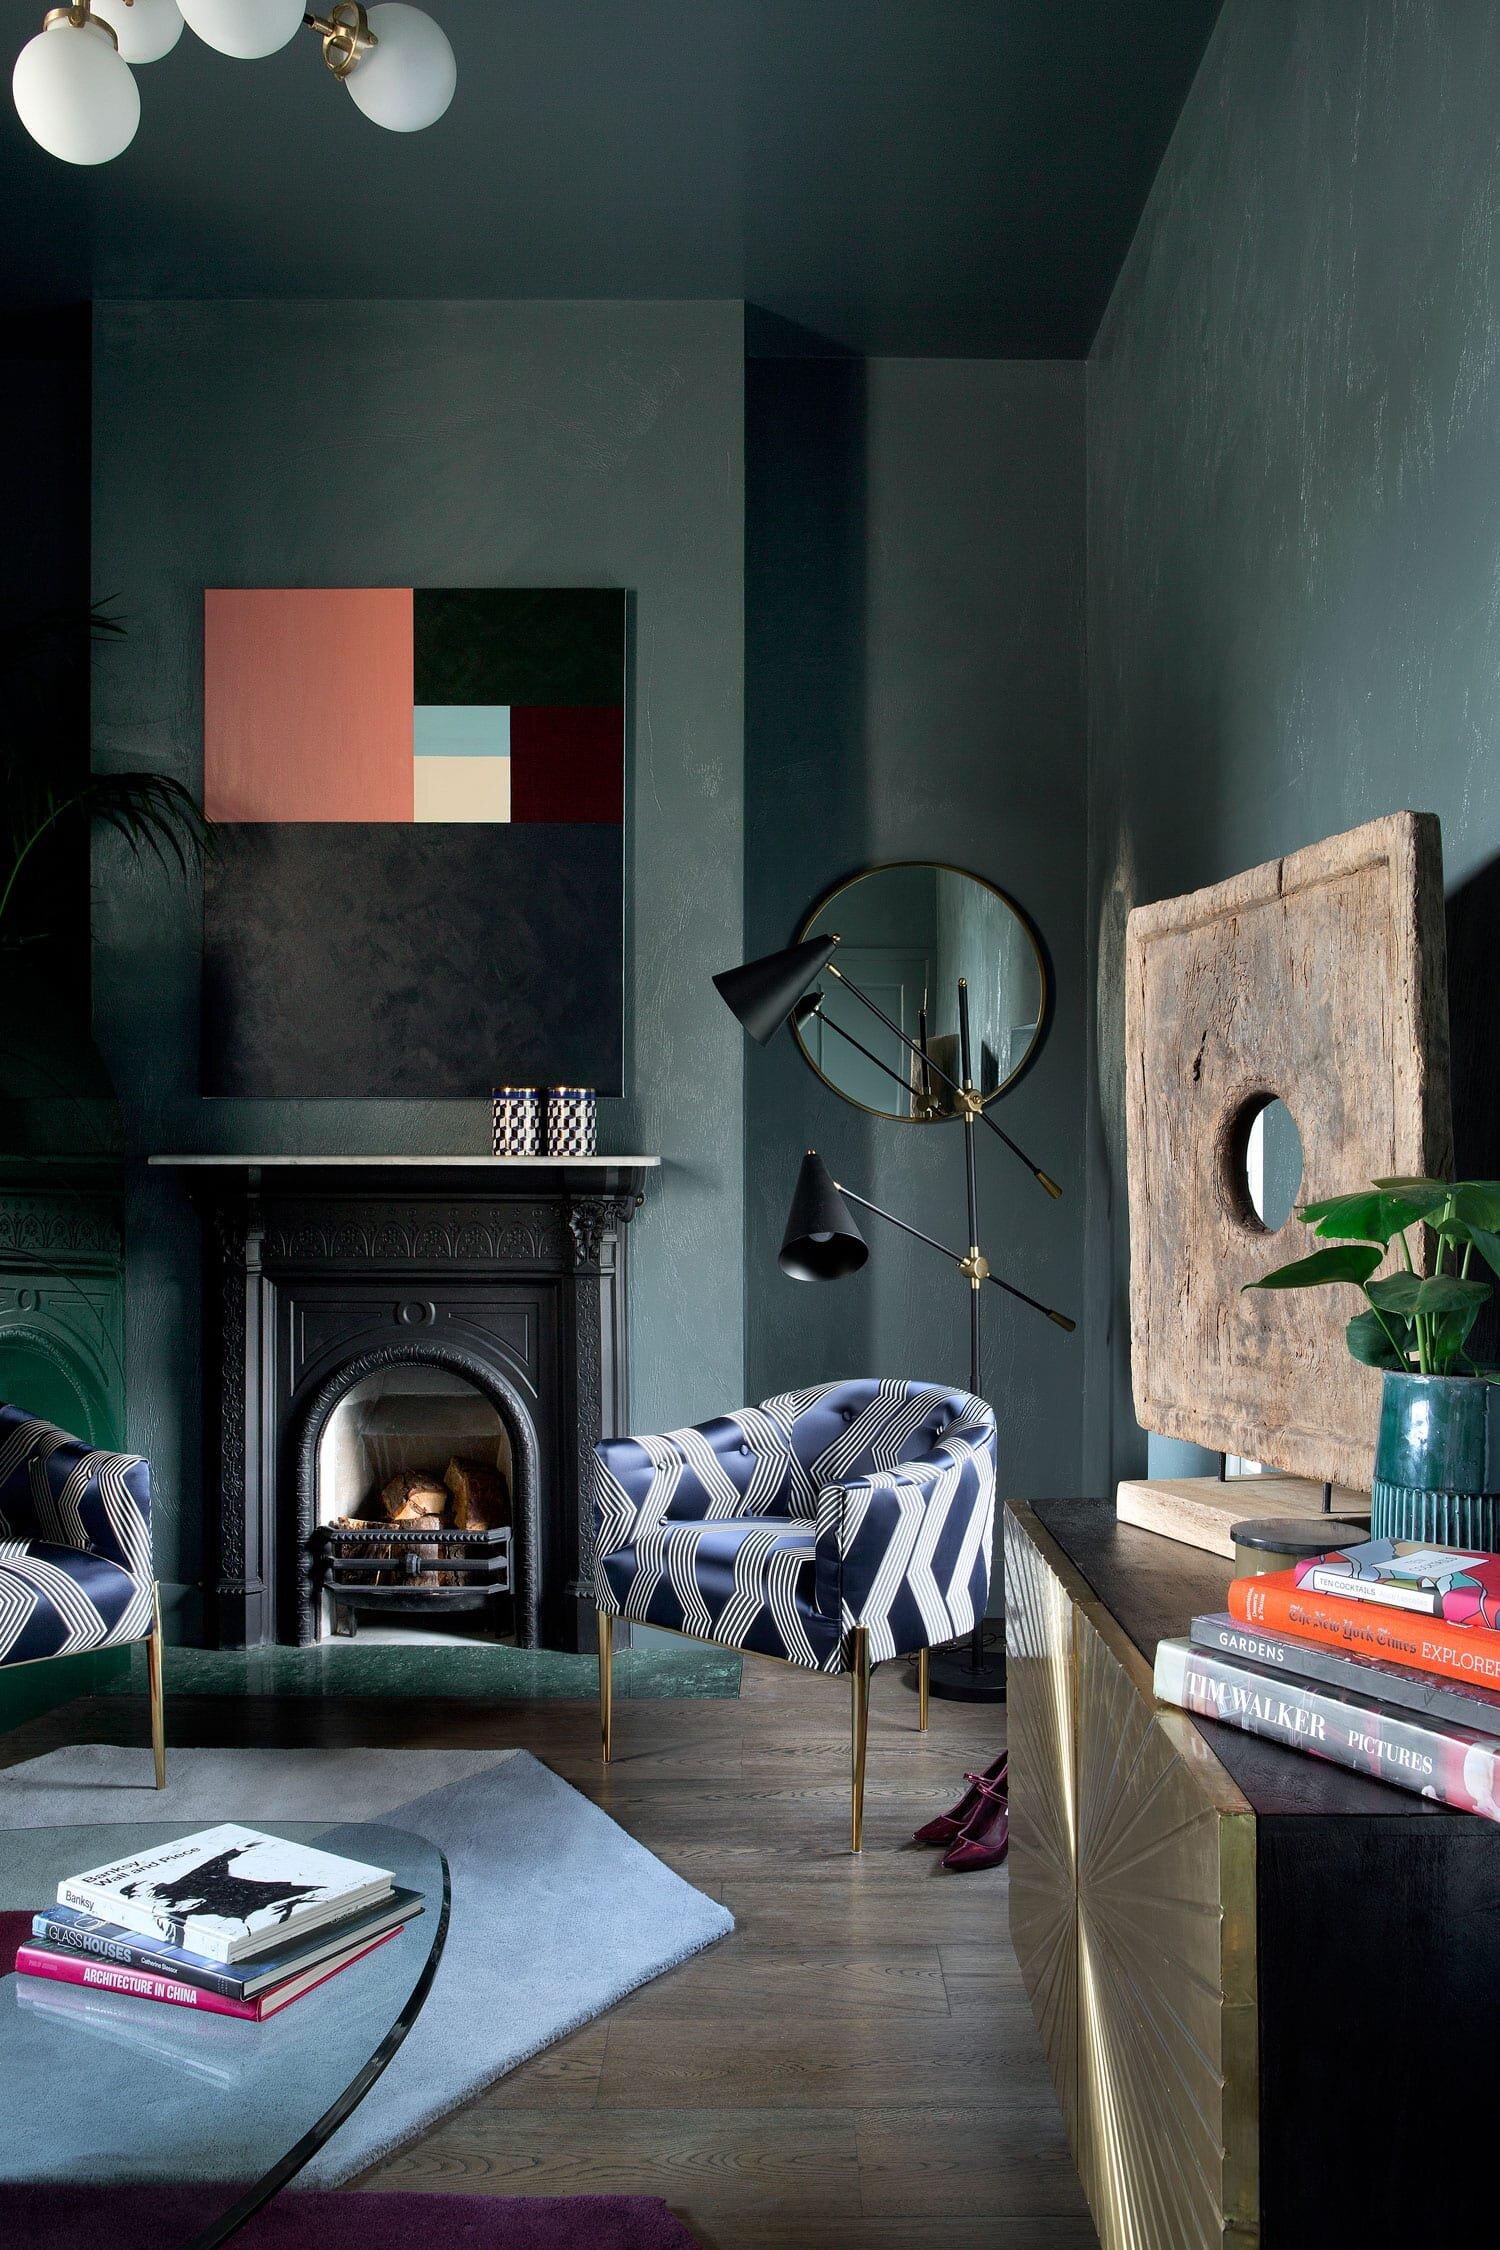 Bolton-Coach-House-Dublin-by-Kingston-Lafferty-Design-Yellowtrace-14.jpg